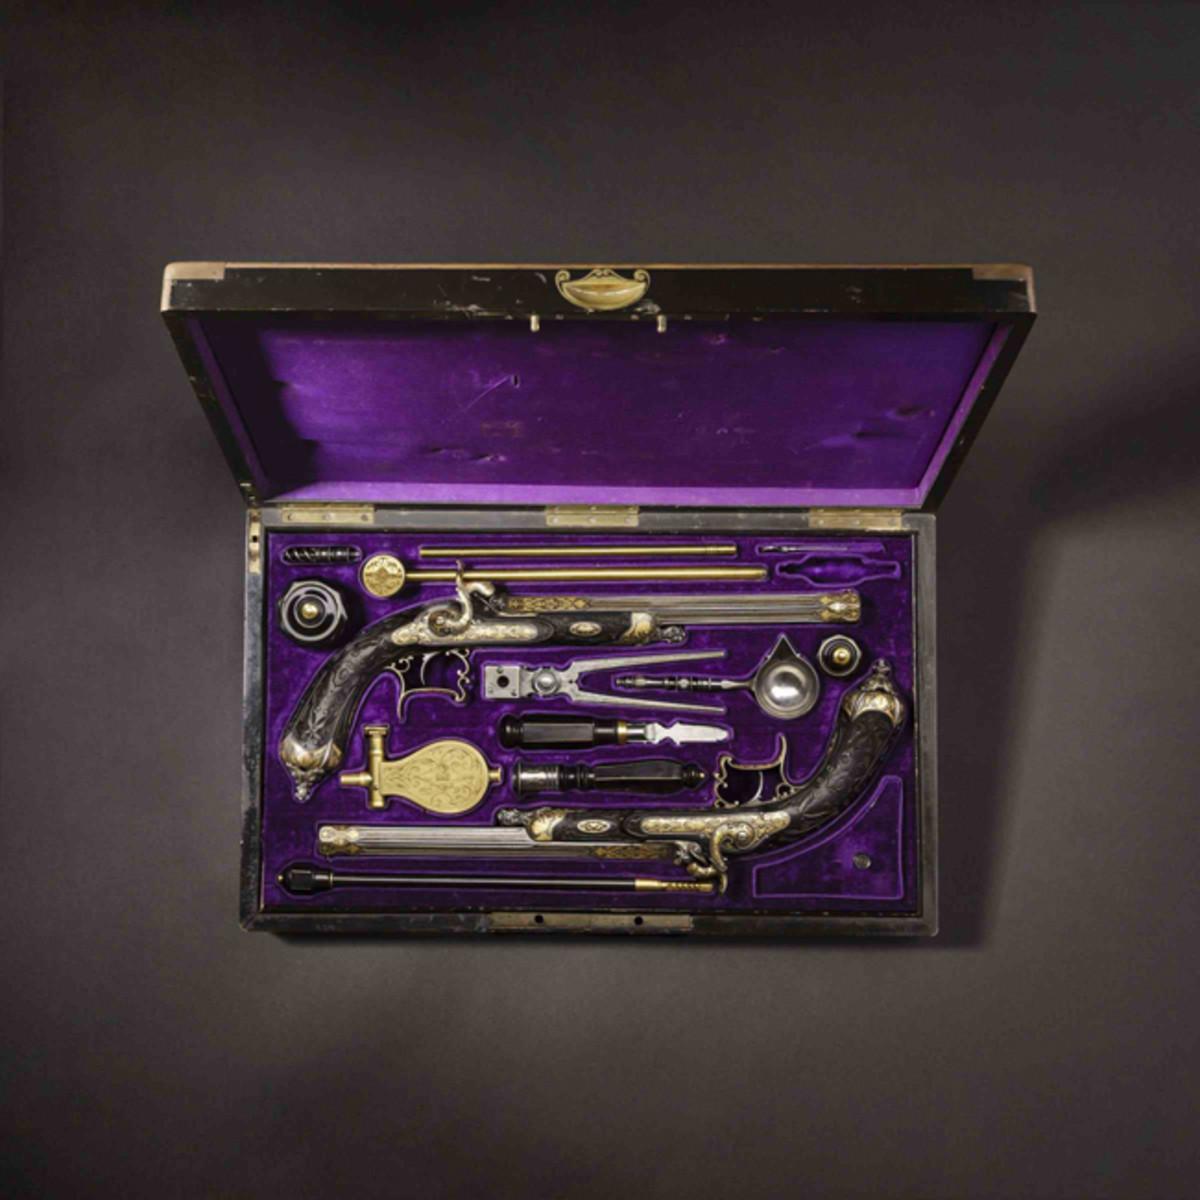 Paar goldtauschierte Luxus-Perkussionspistolen, A. De Lezaack, Lüttich um 1860.